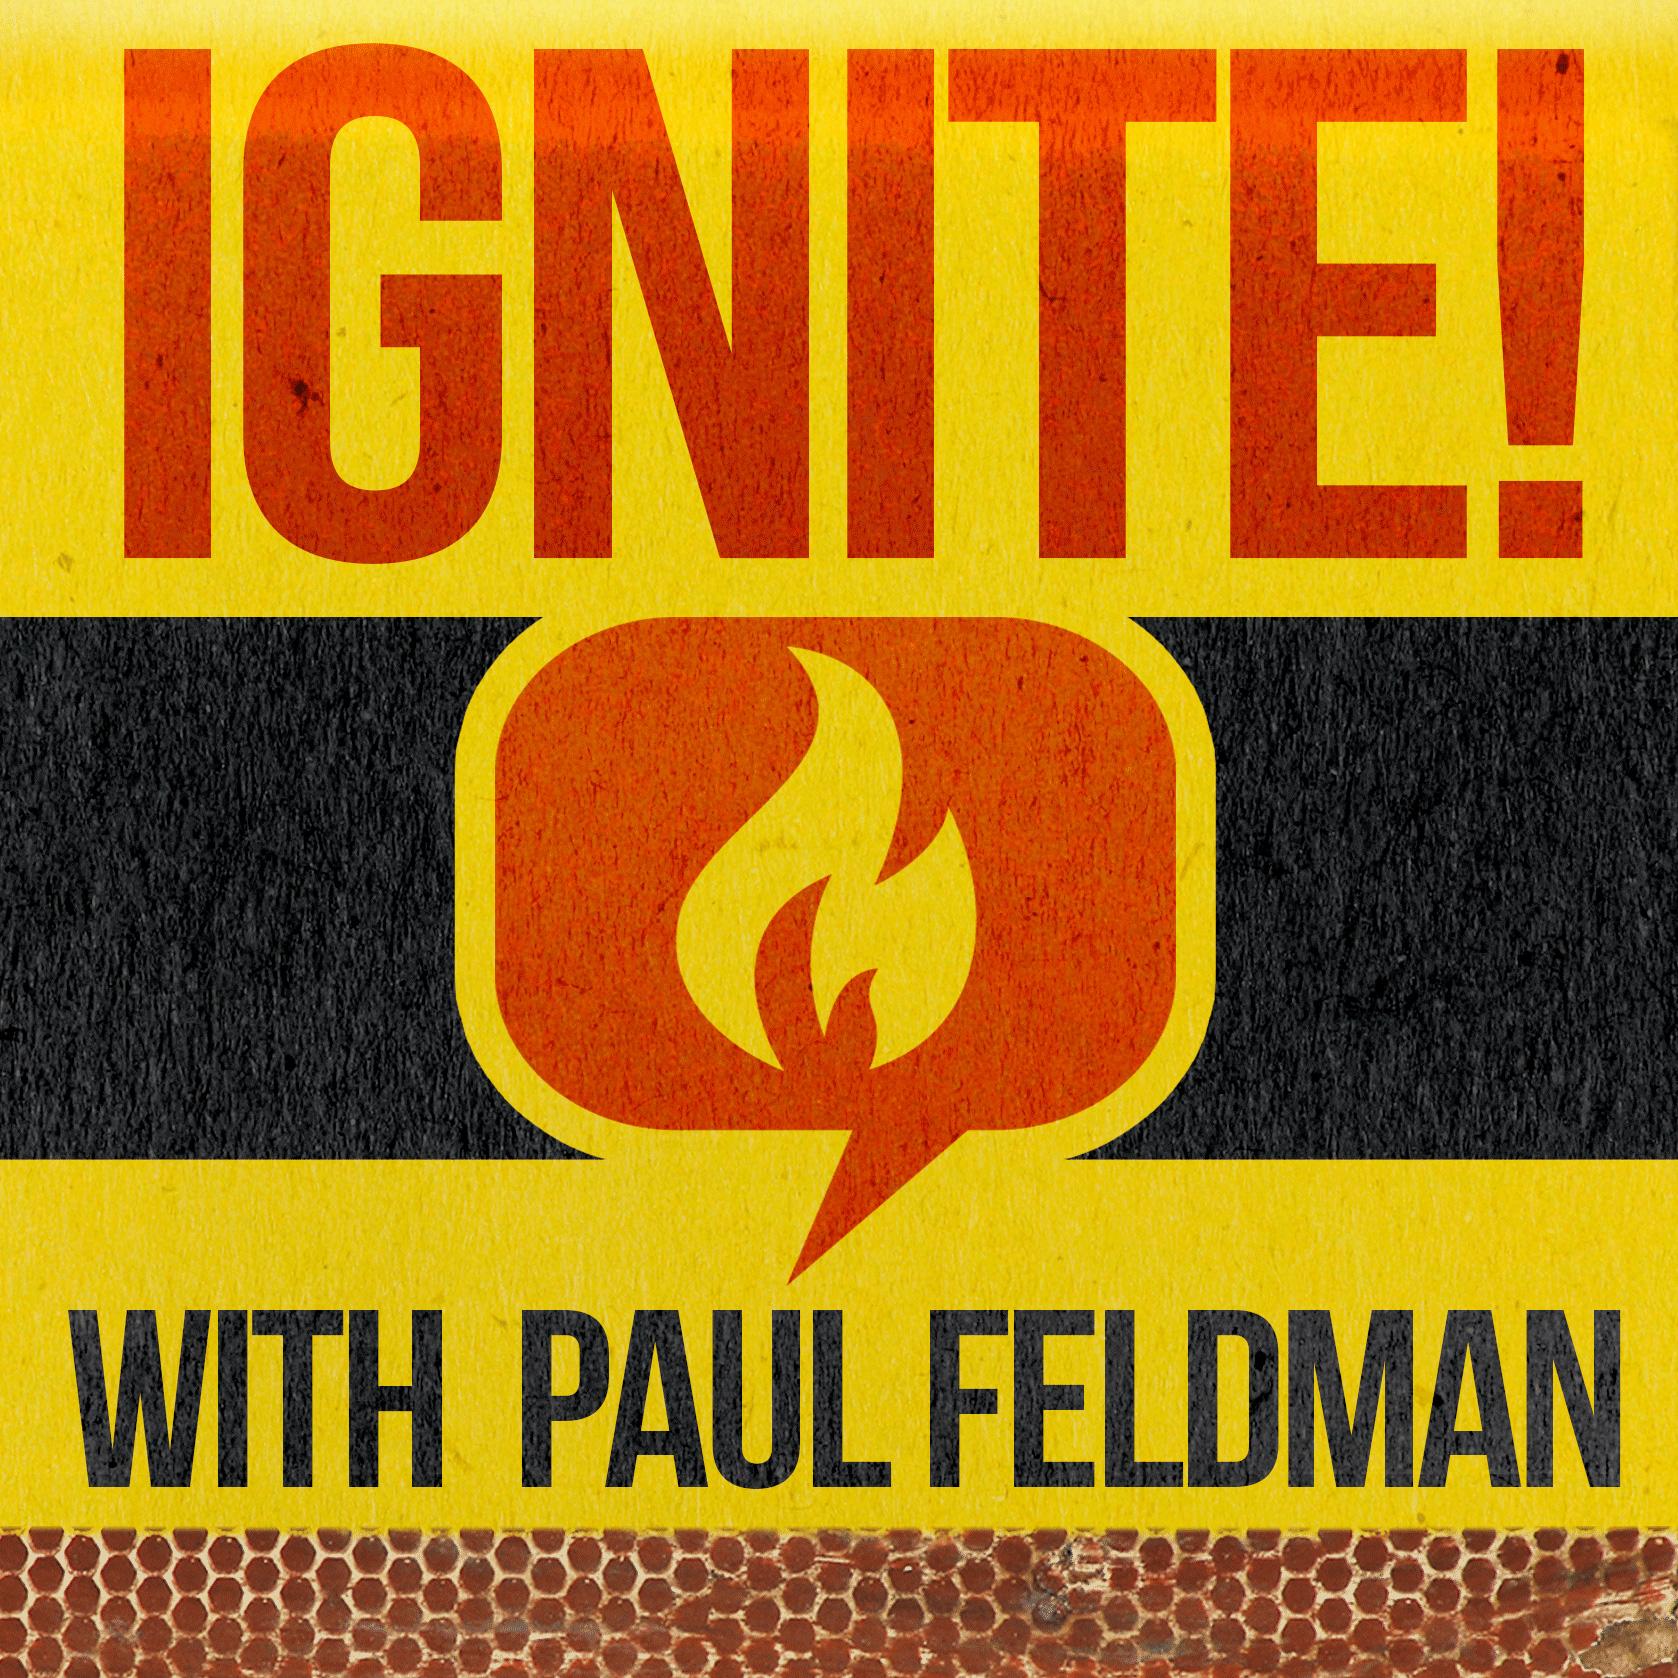 Ignite! with Paul Feldman